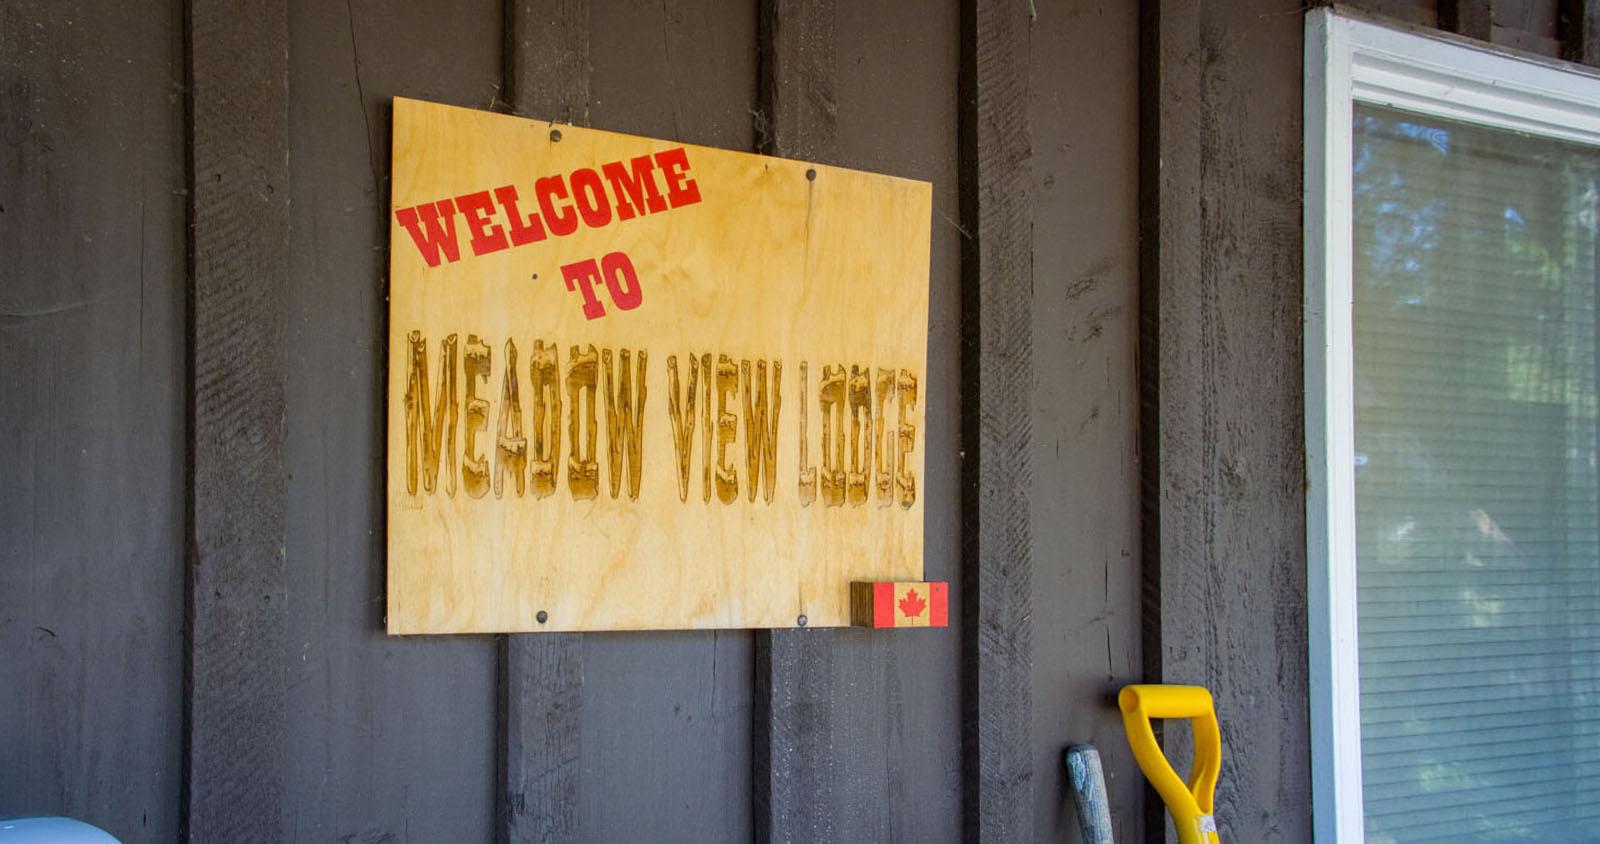 Meadowview lodge 59